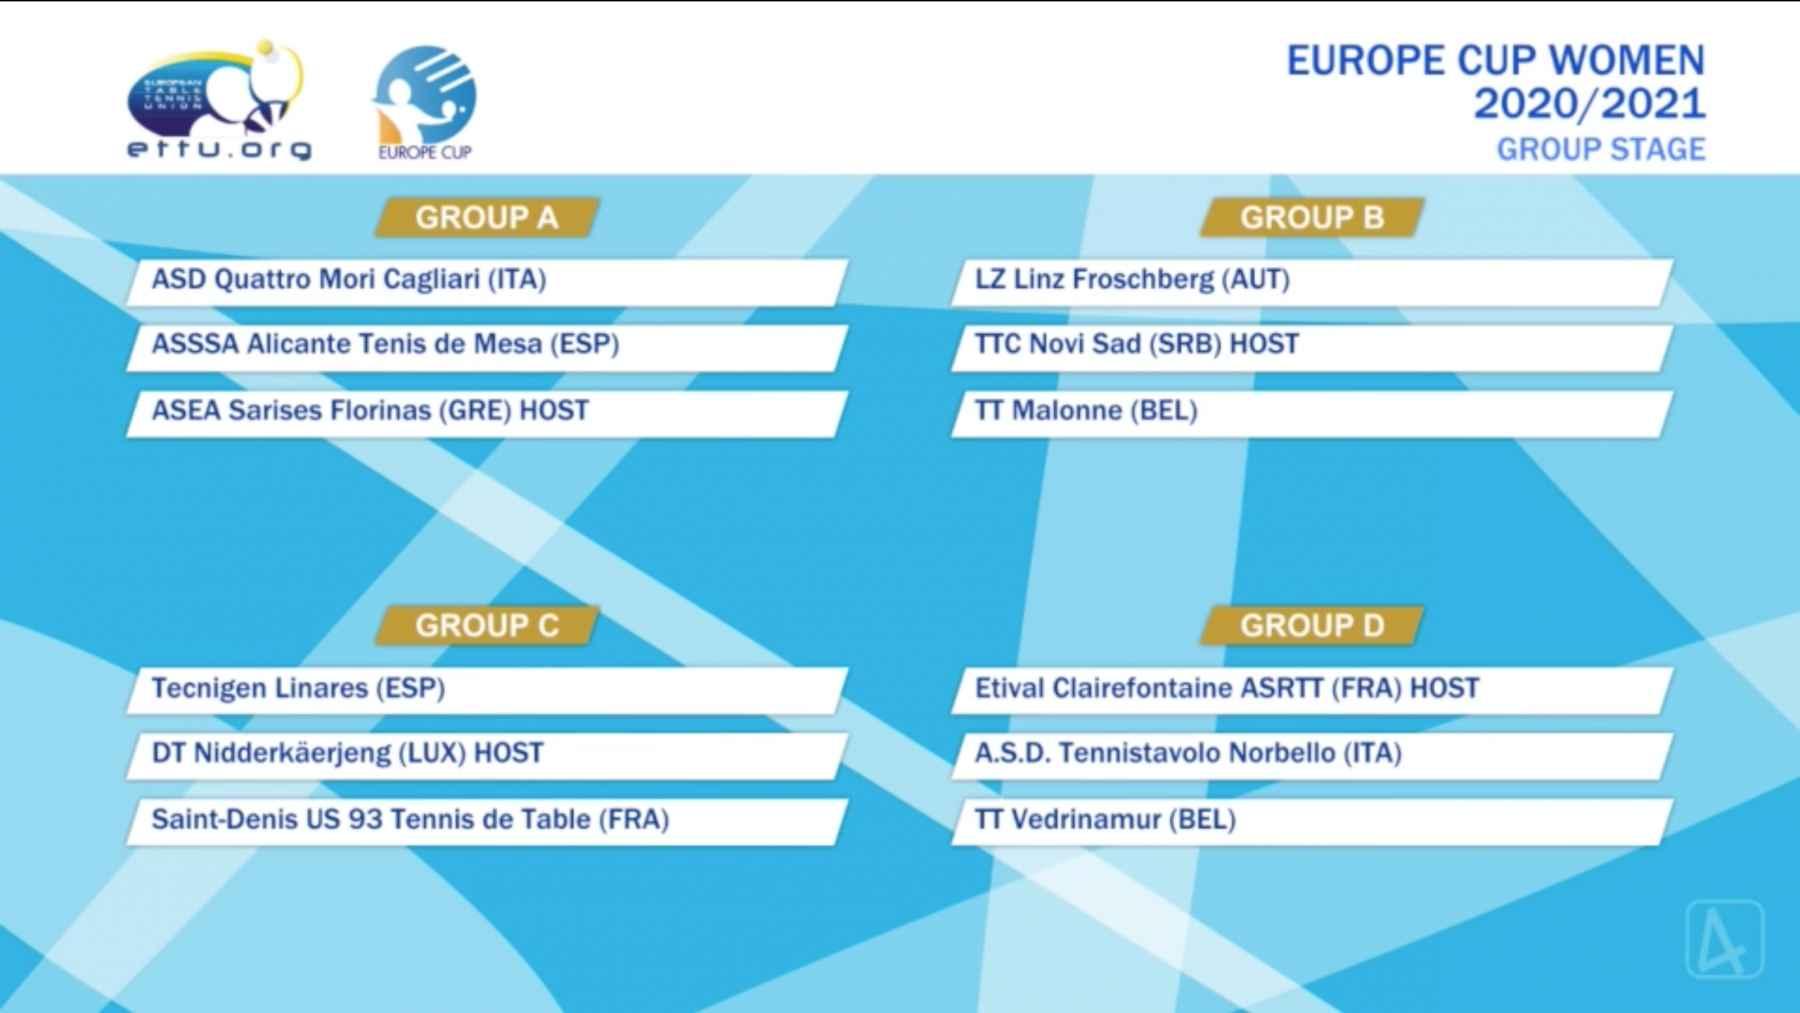 Europe Cup Women